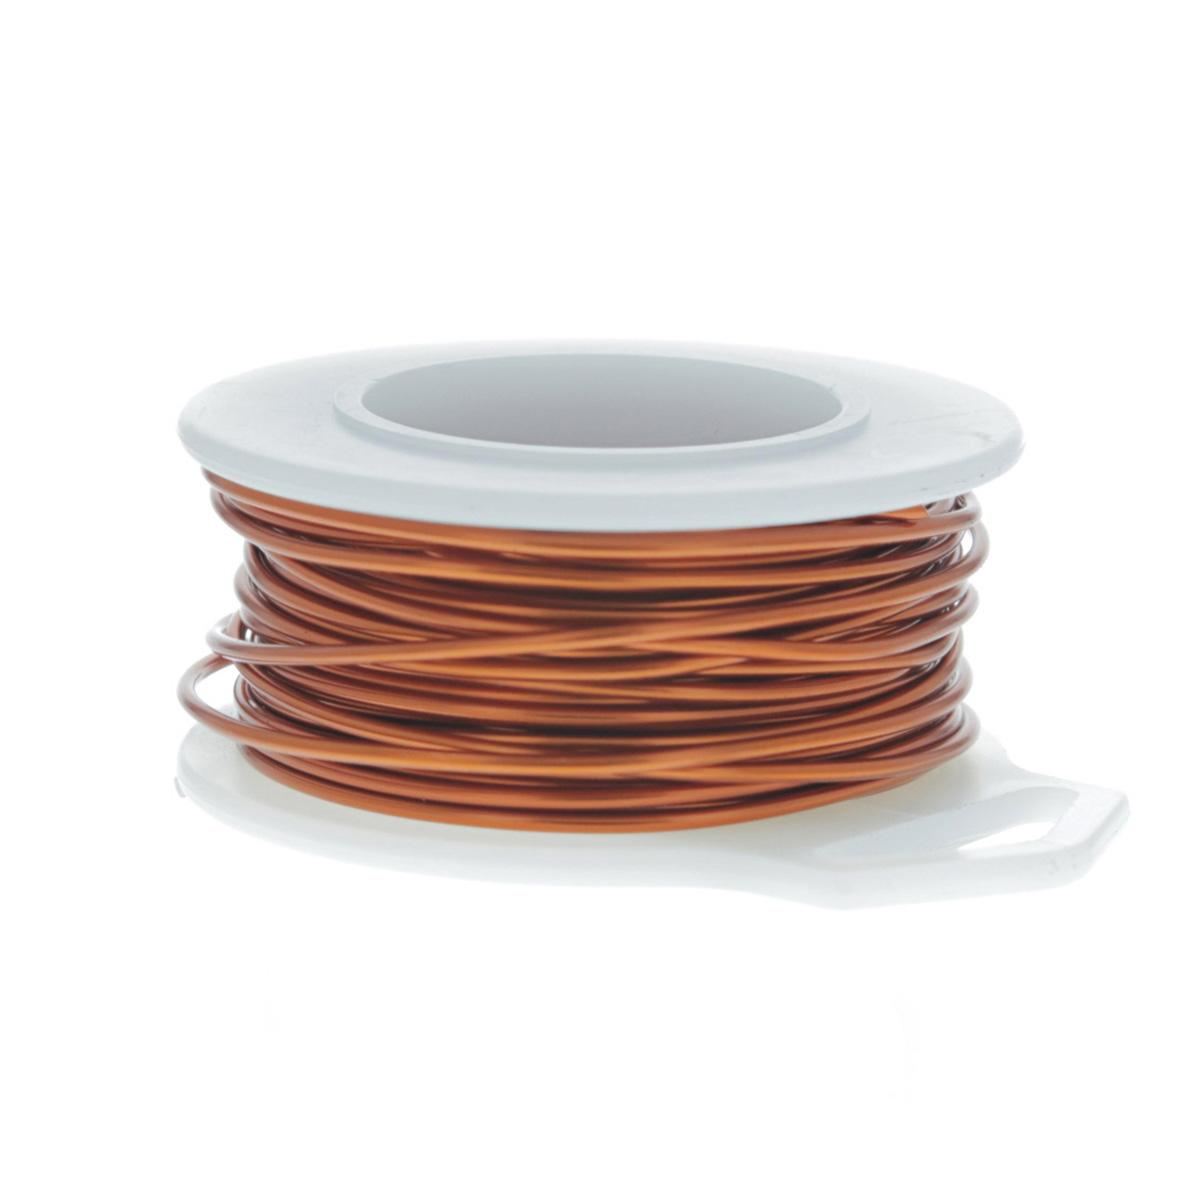 22 gauge round amber enameled craft wire 45 ft wire for 22 gauge craft wire